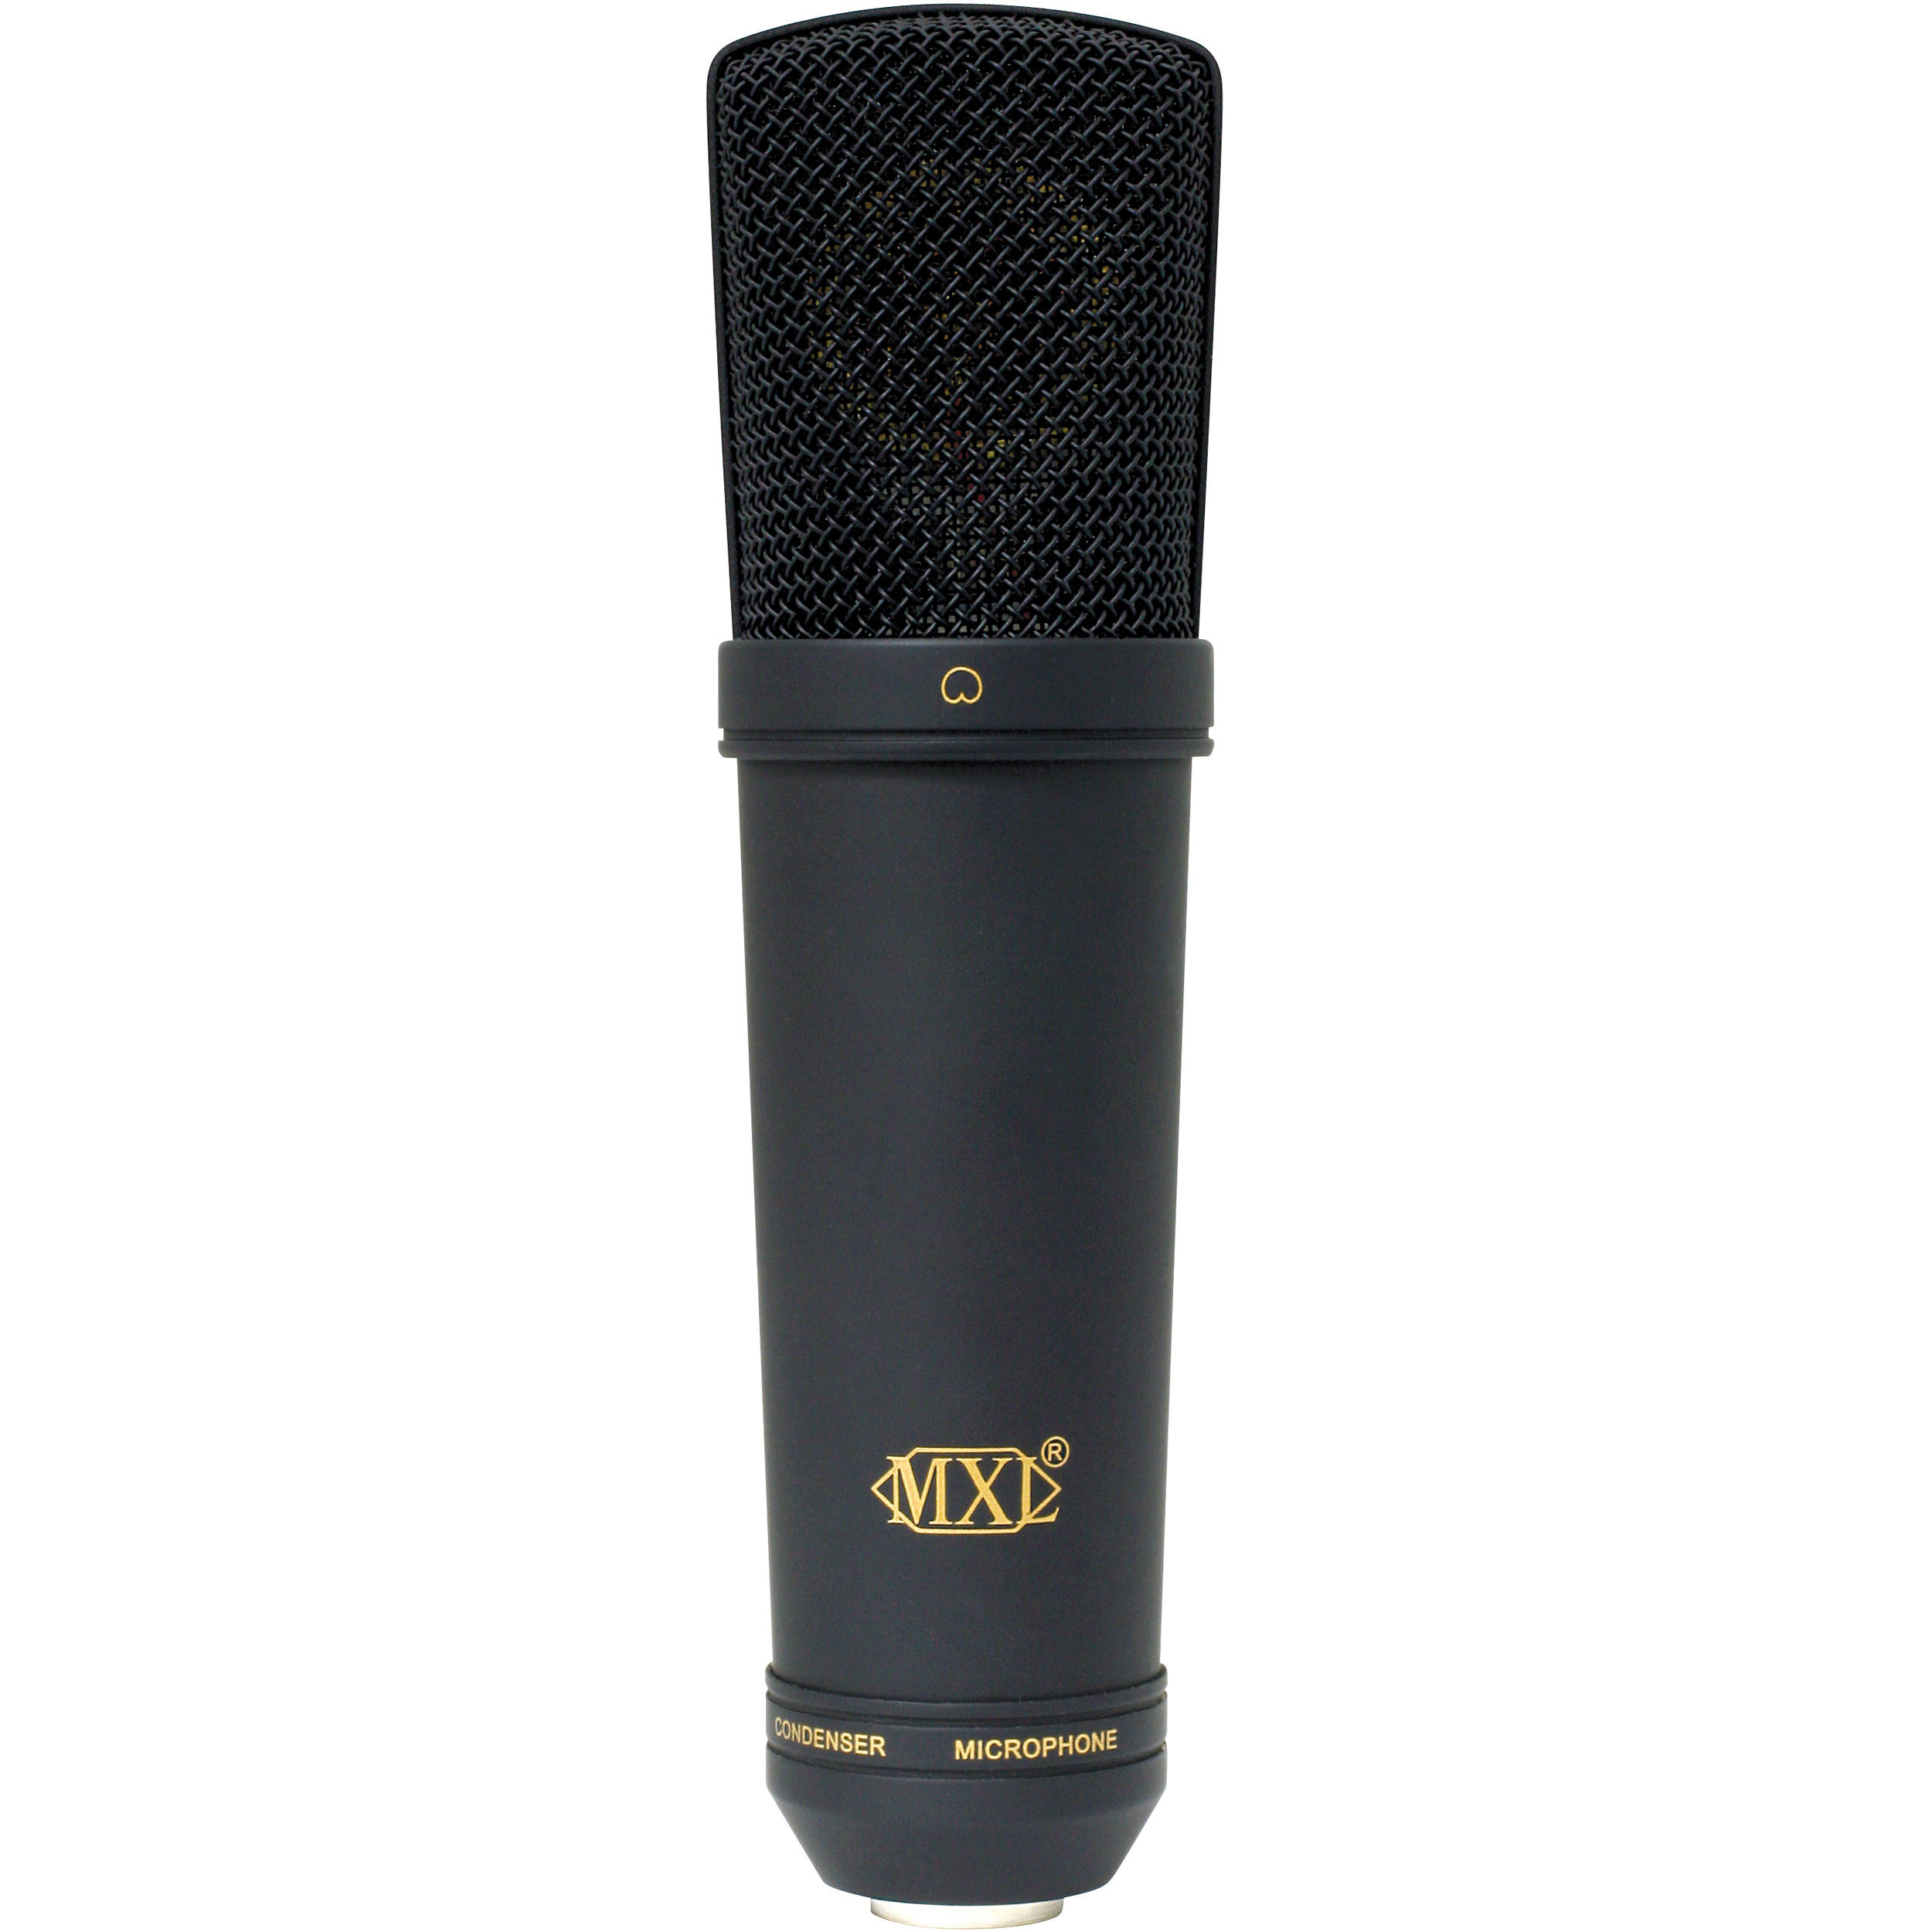 mxl 2003a large capsule condenser microphone 2003a b h photo. Black Bedroom Furniture Sets. Home Design Ideas